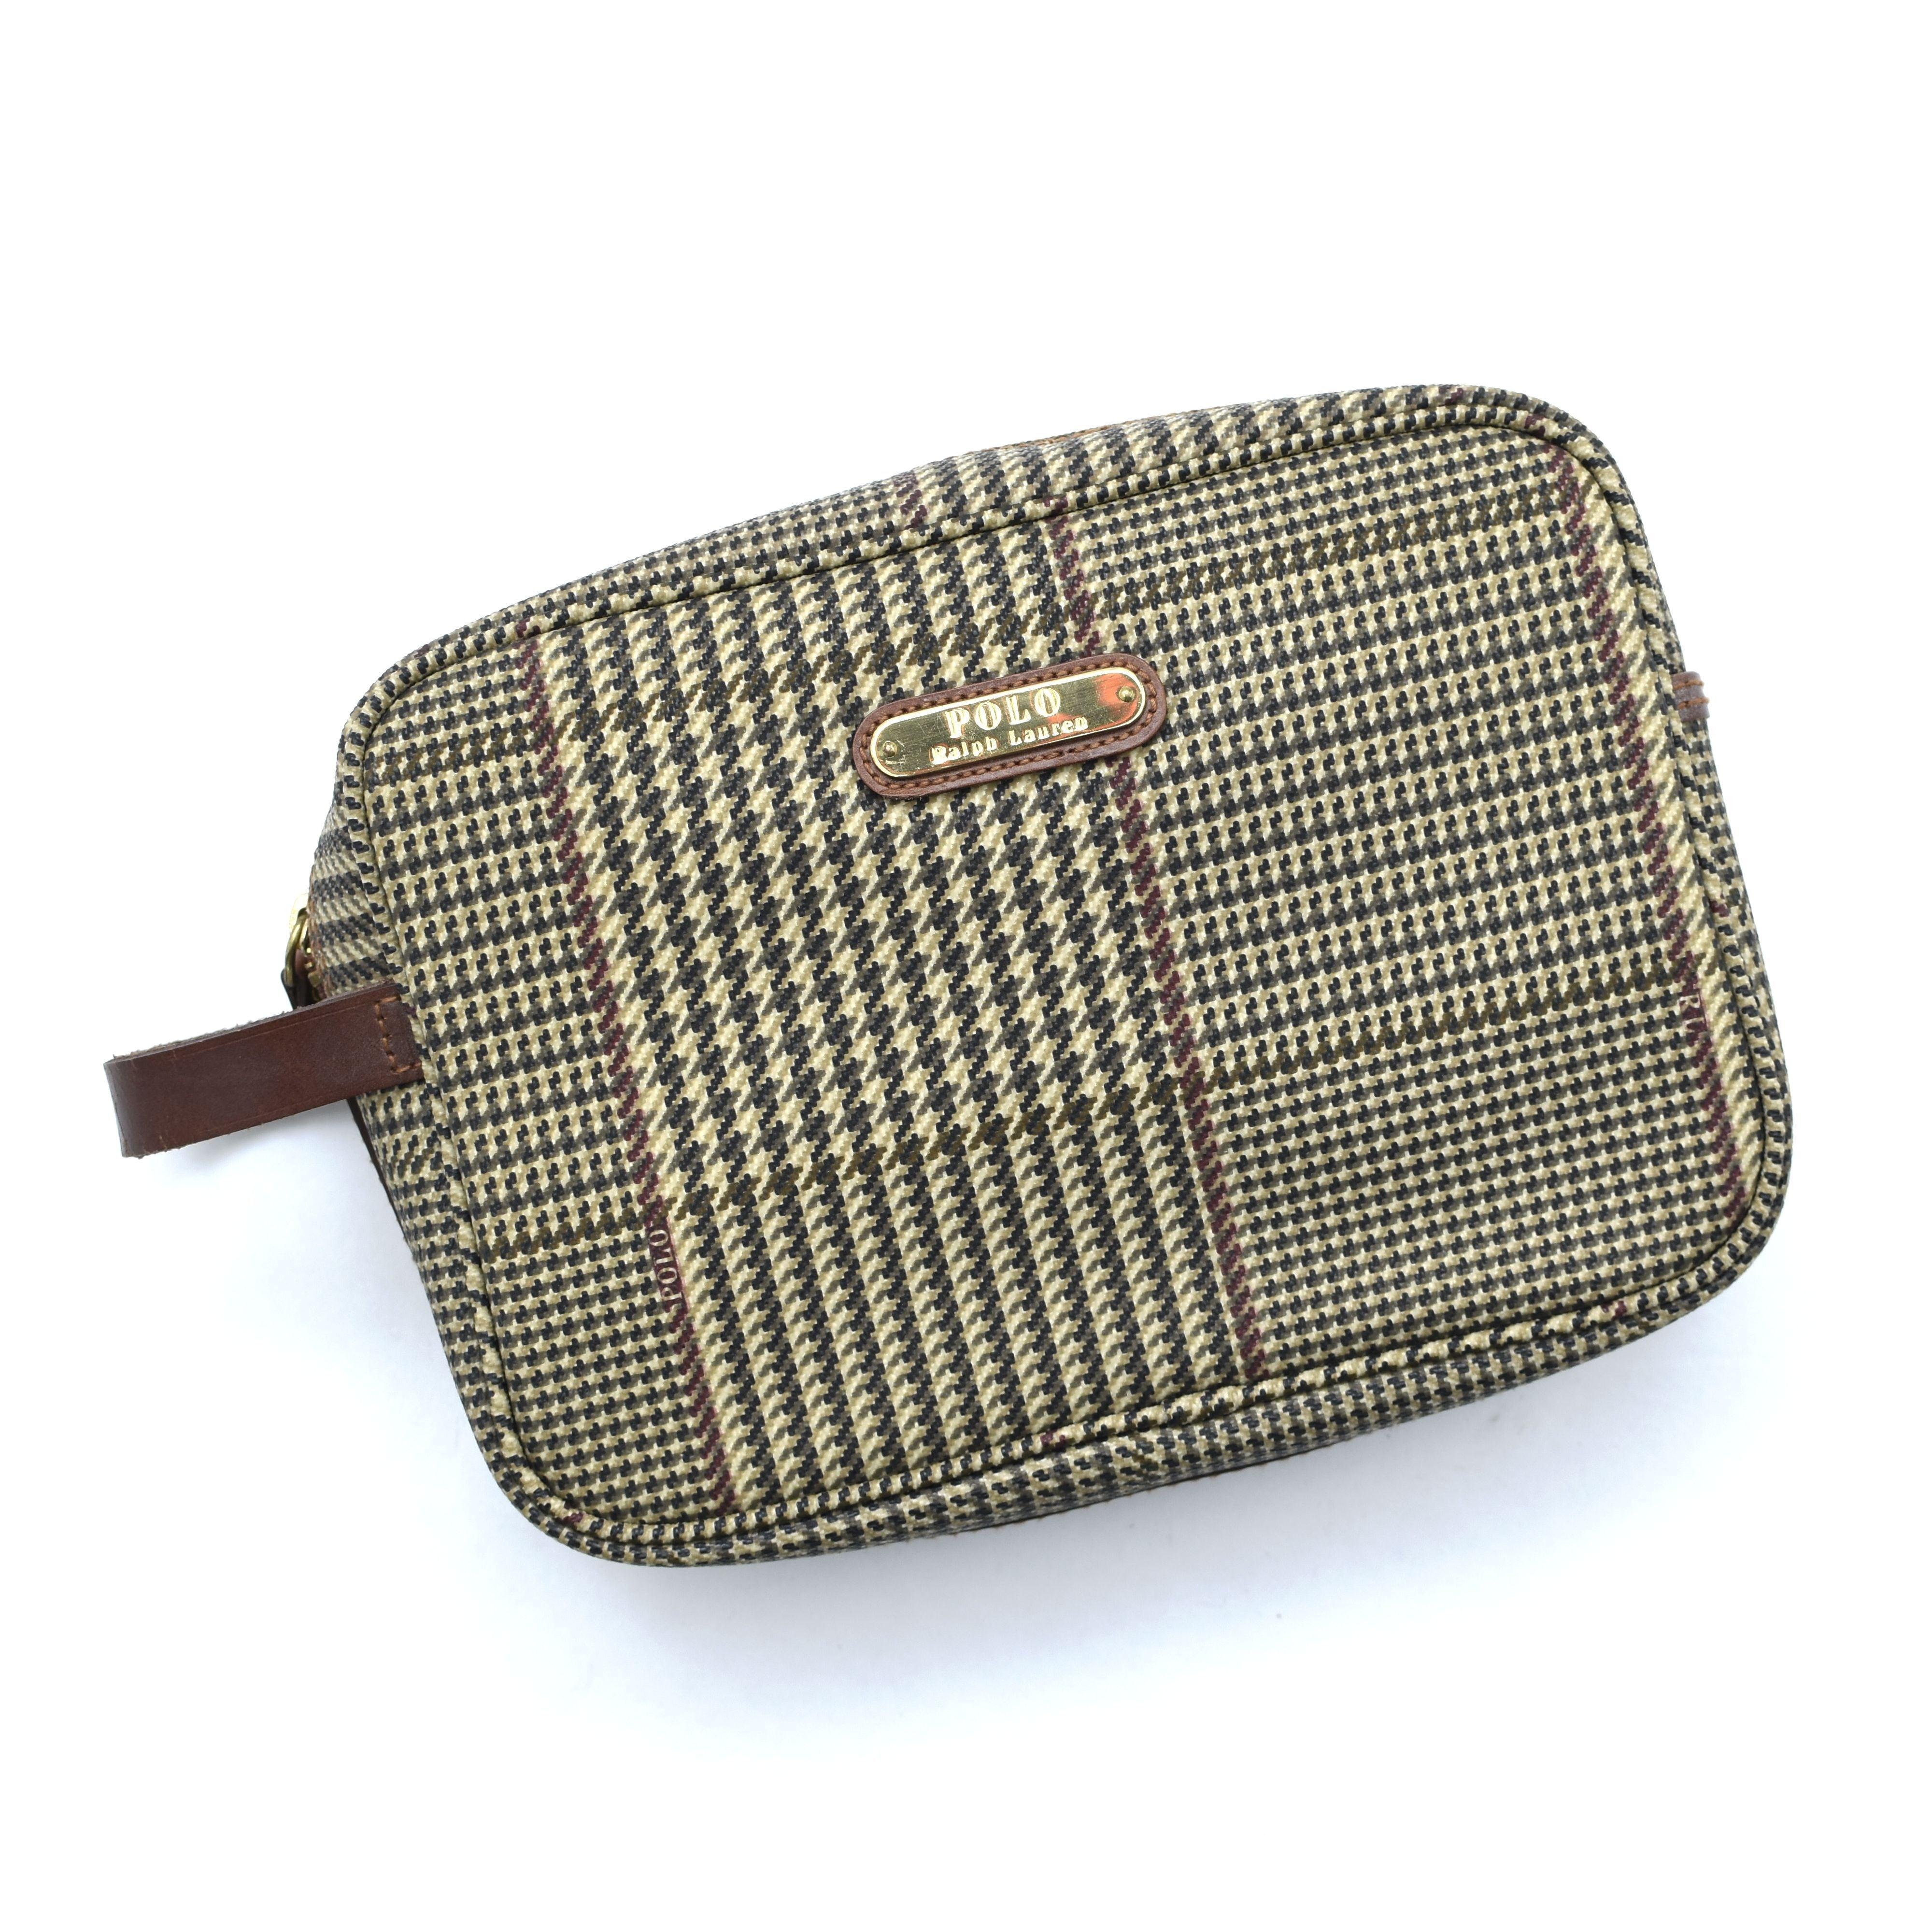 Old POLO Ralph Lauren check clutch bag